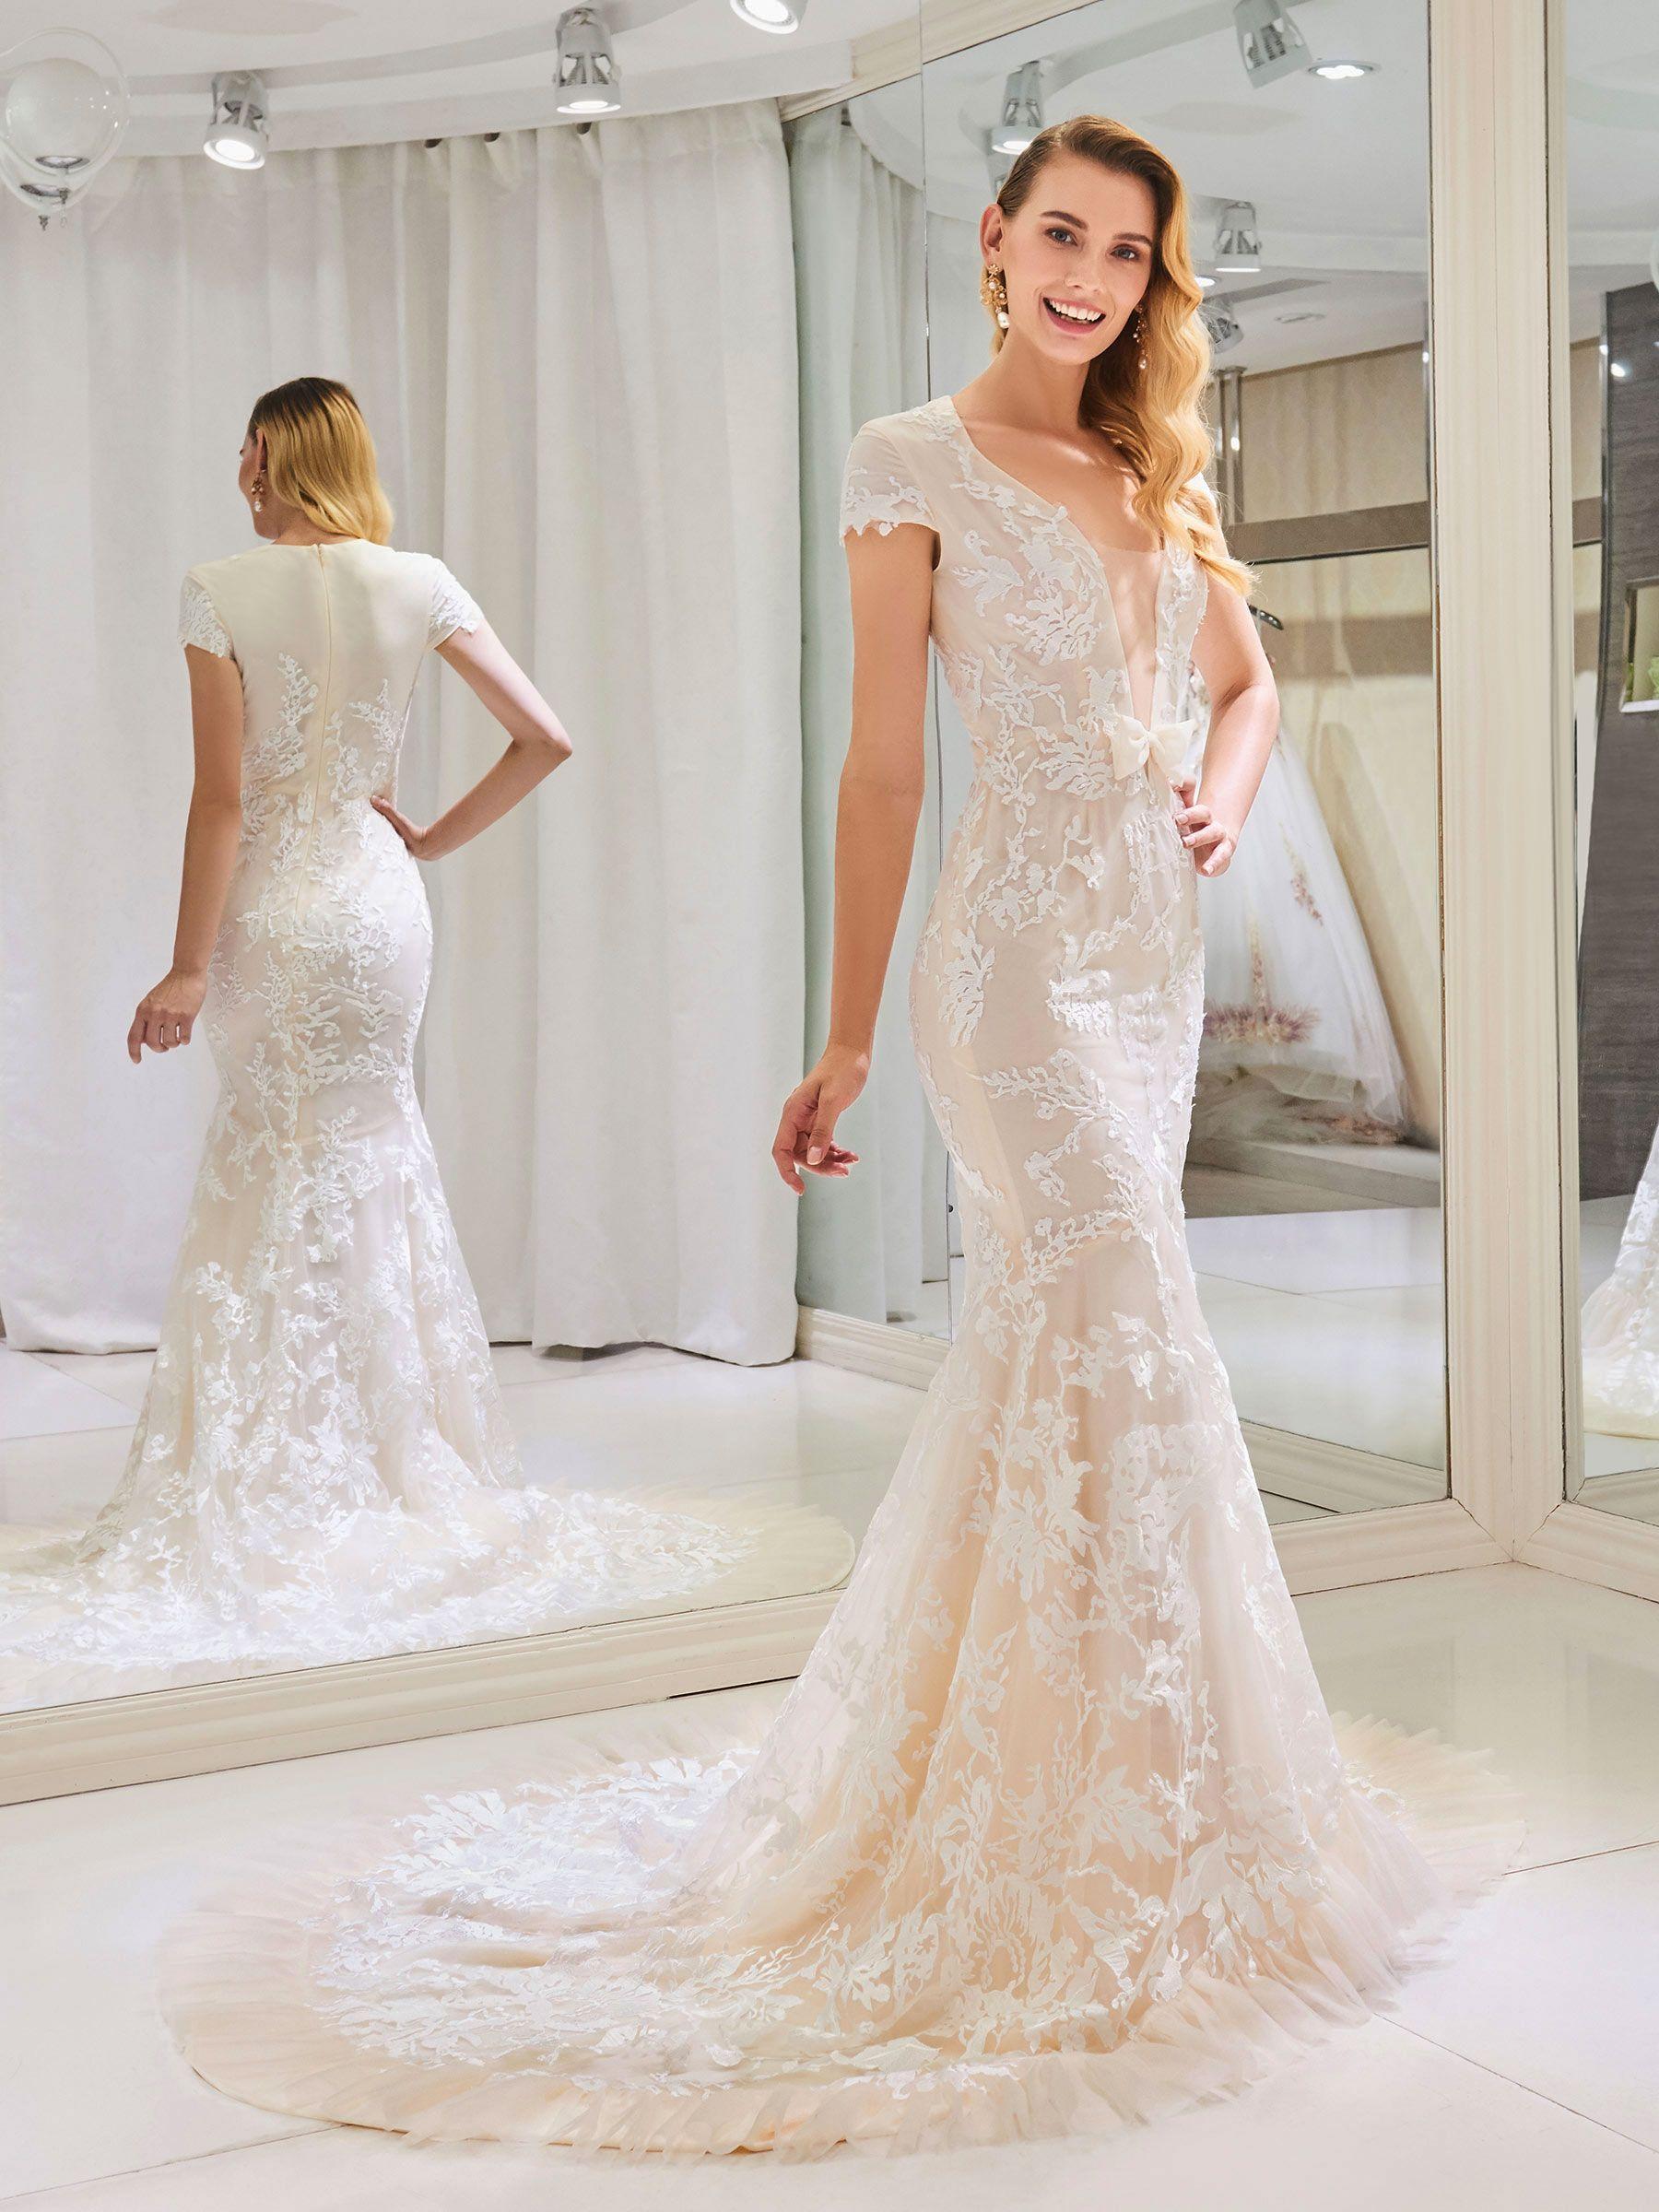 VNeck Cap Sleeve Appliques Lace Mermaid Wedding Dress